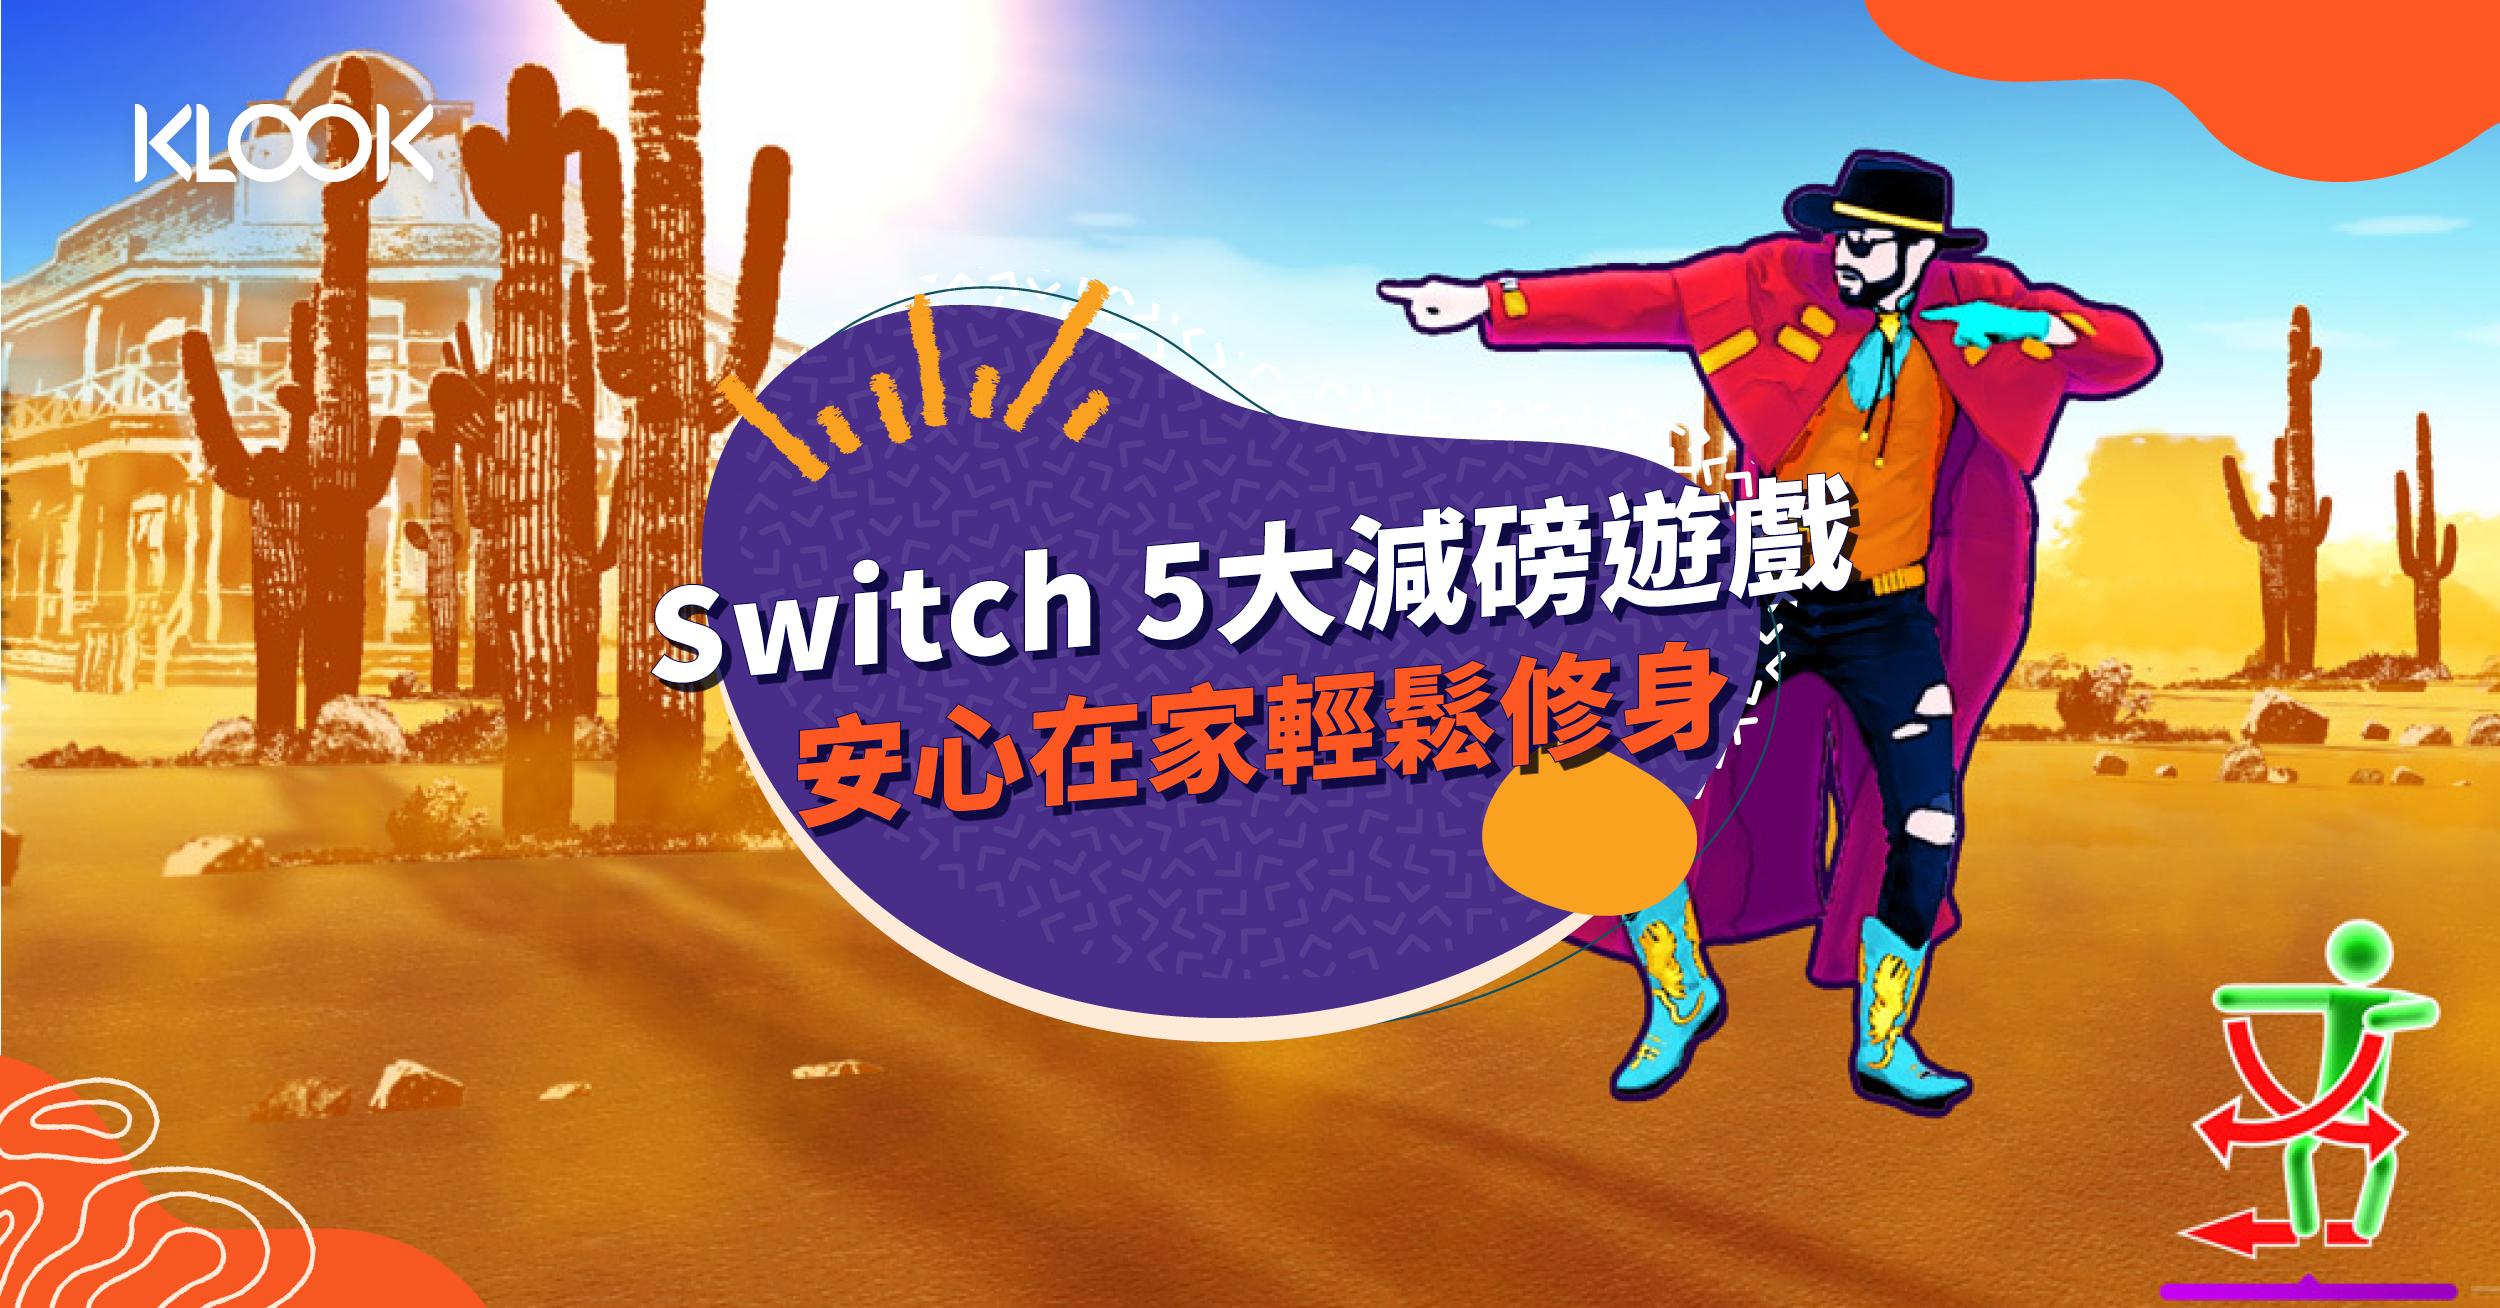 Switch 5大減磅遊戲 安心在家輕鬆修身